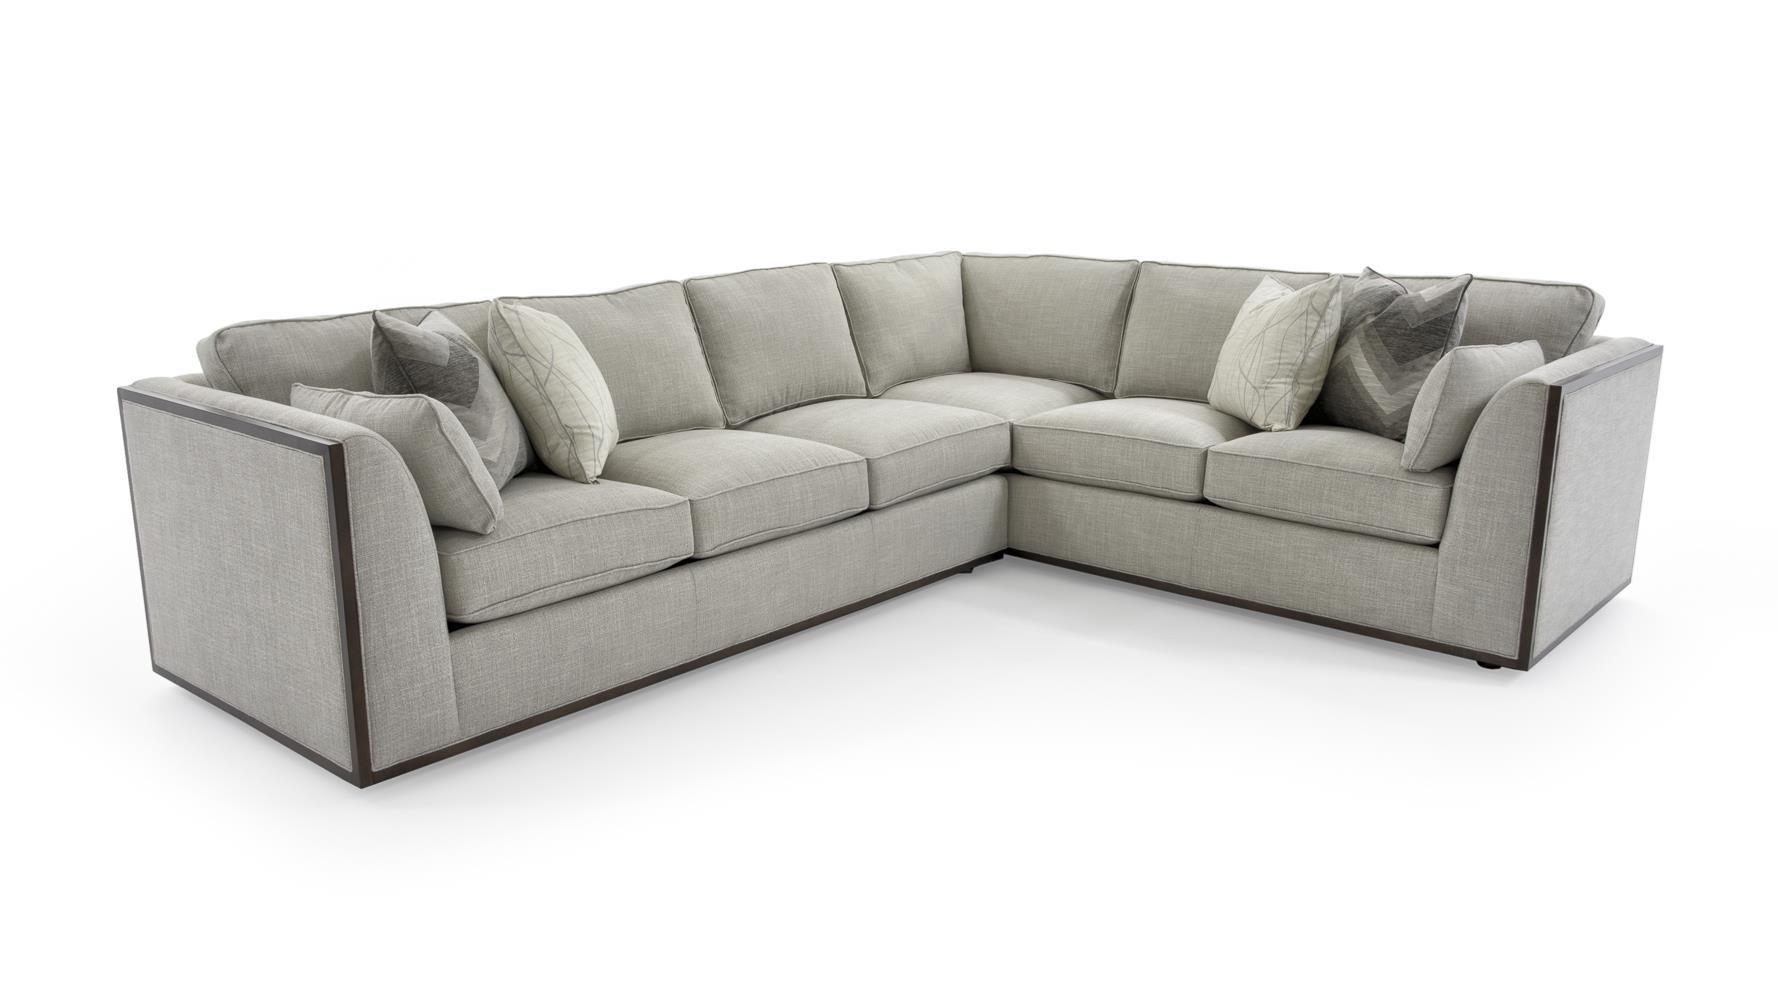 Westcliffe 2 Pc Sectional Sofa